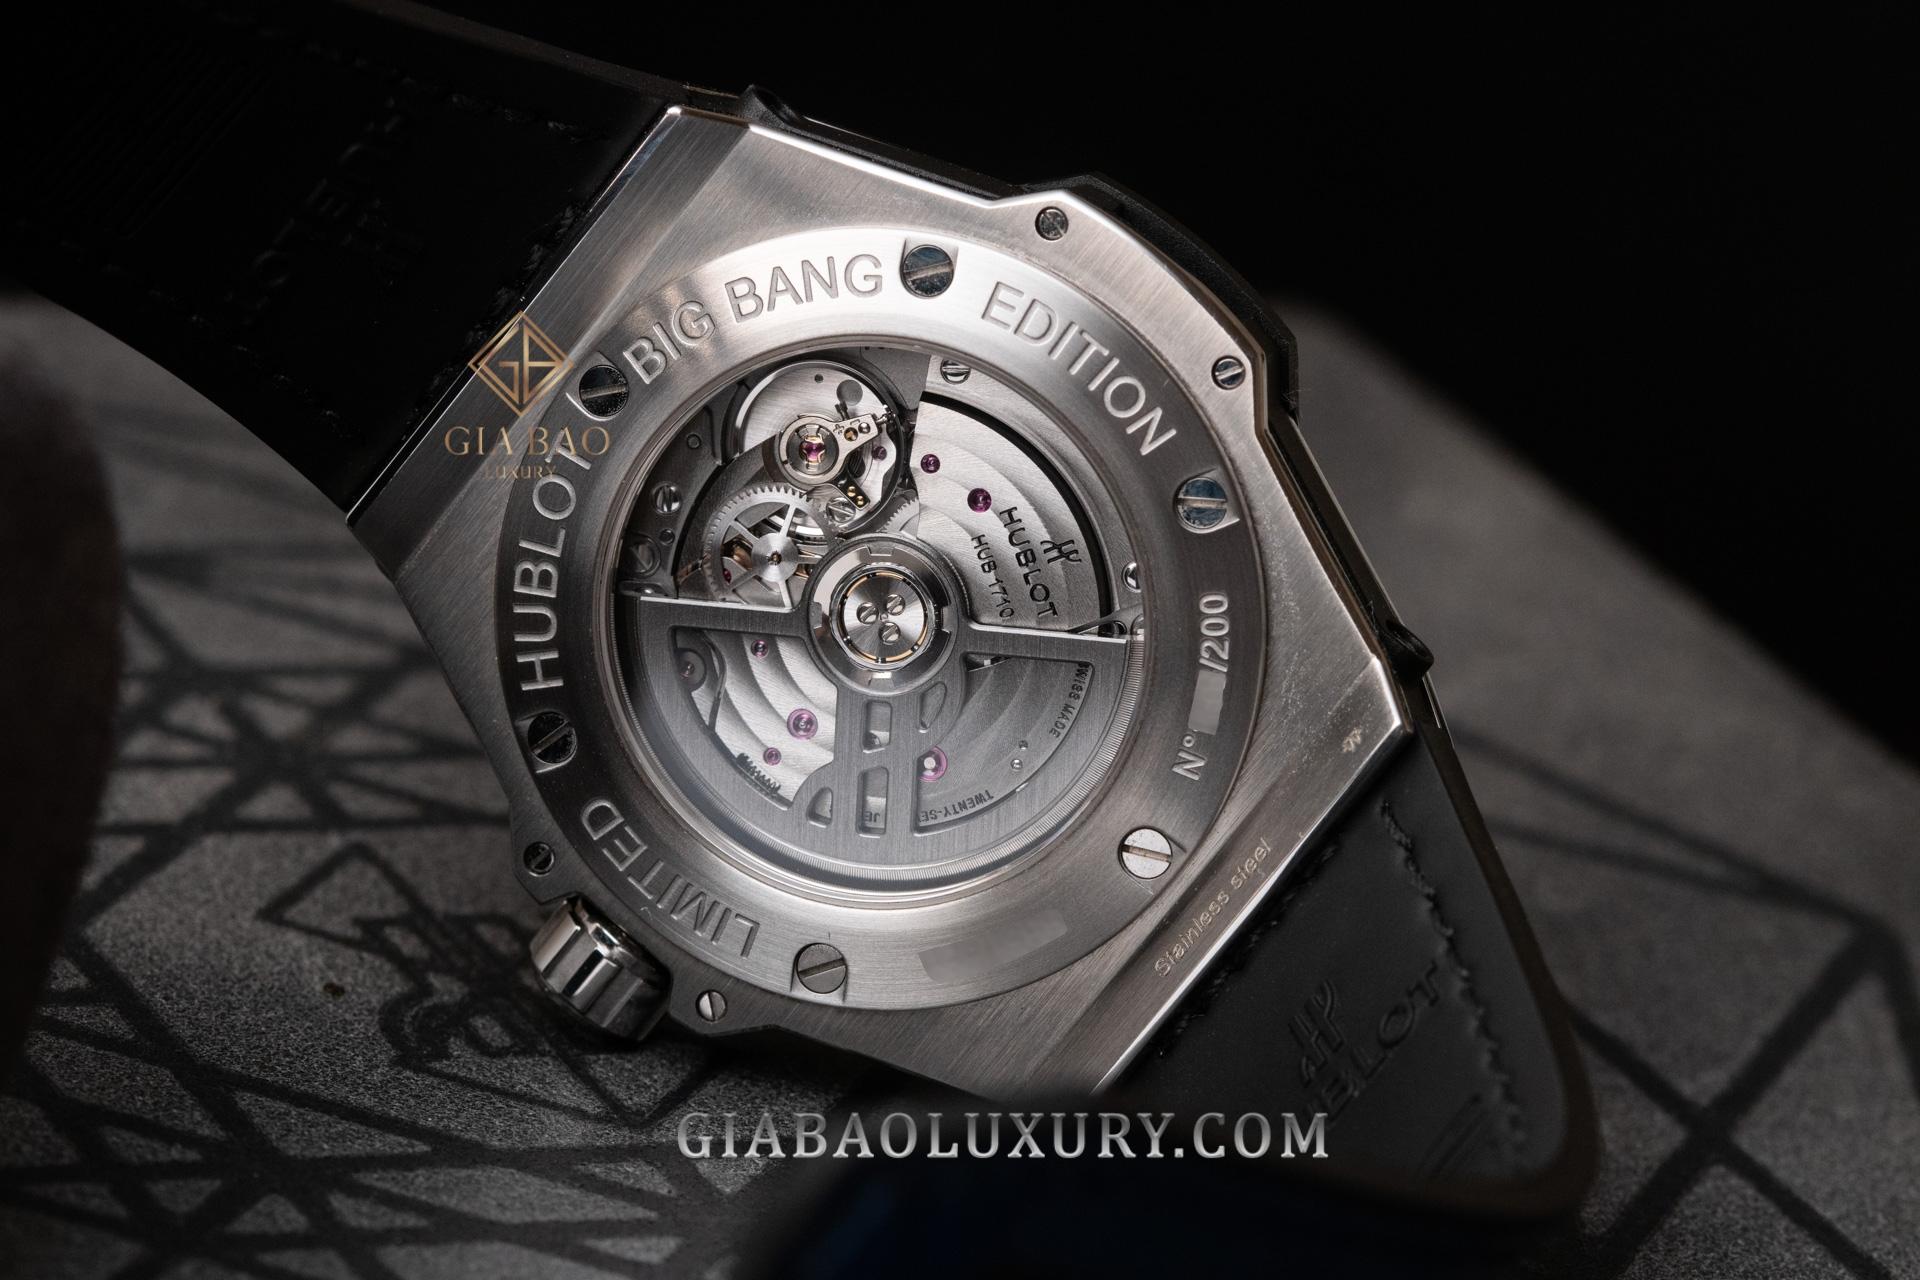 Đồng Hồ Hublot Big Bang Sang Bleu Titanium 39mm 465.SS.7179.VR.1204.MXM19